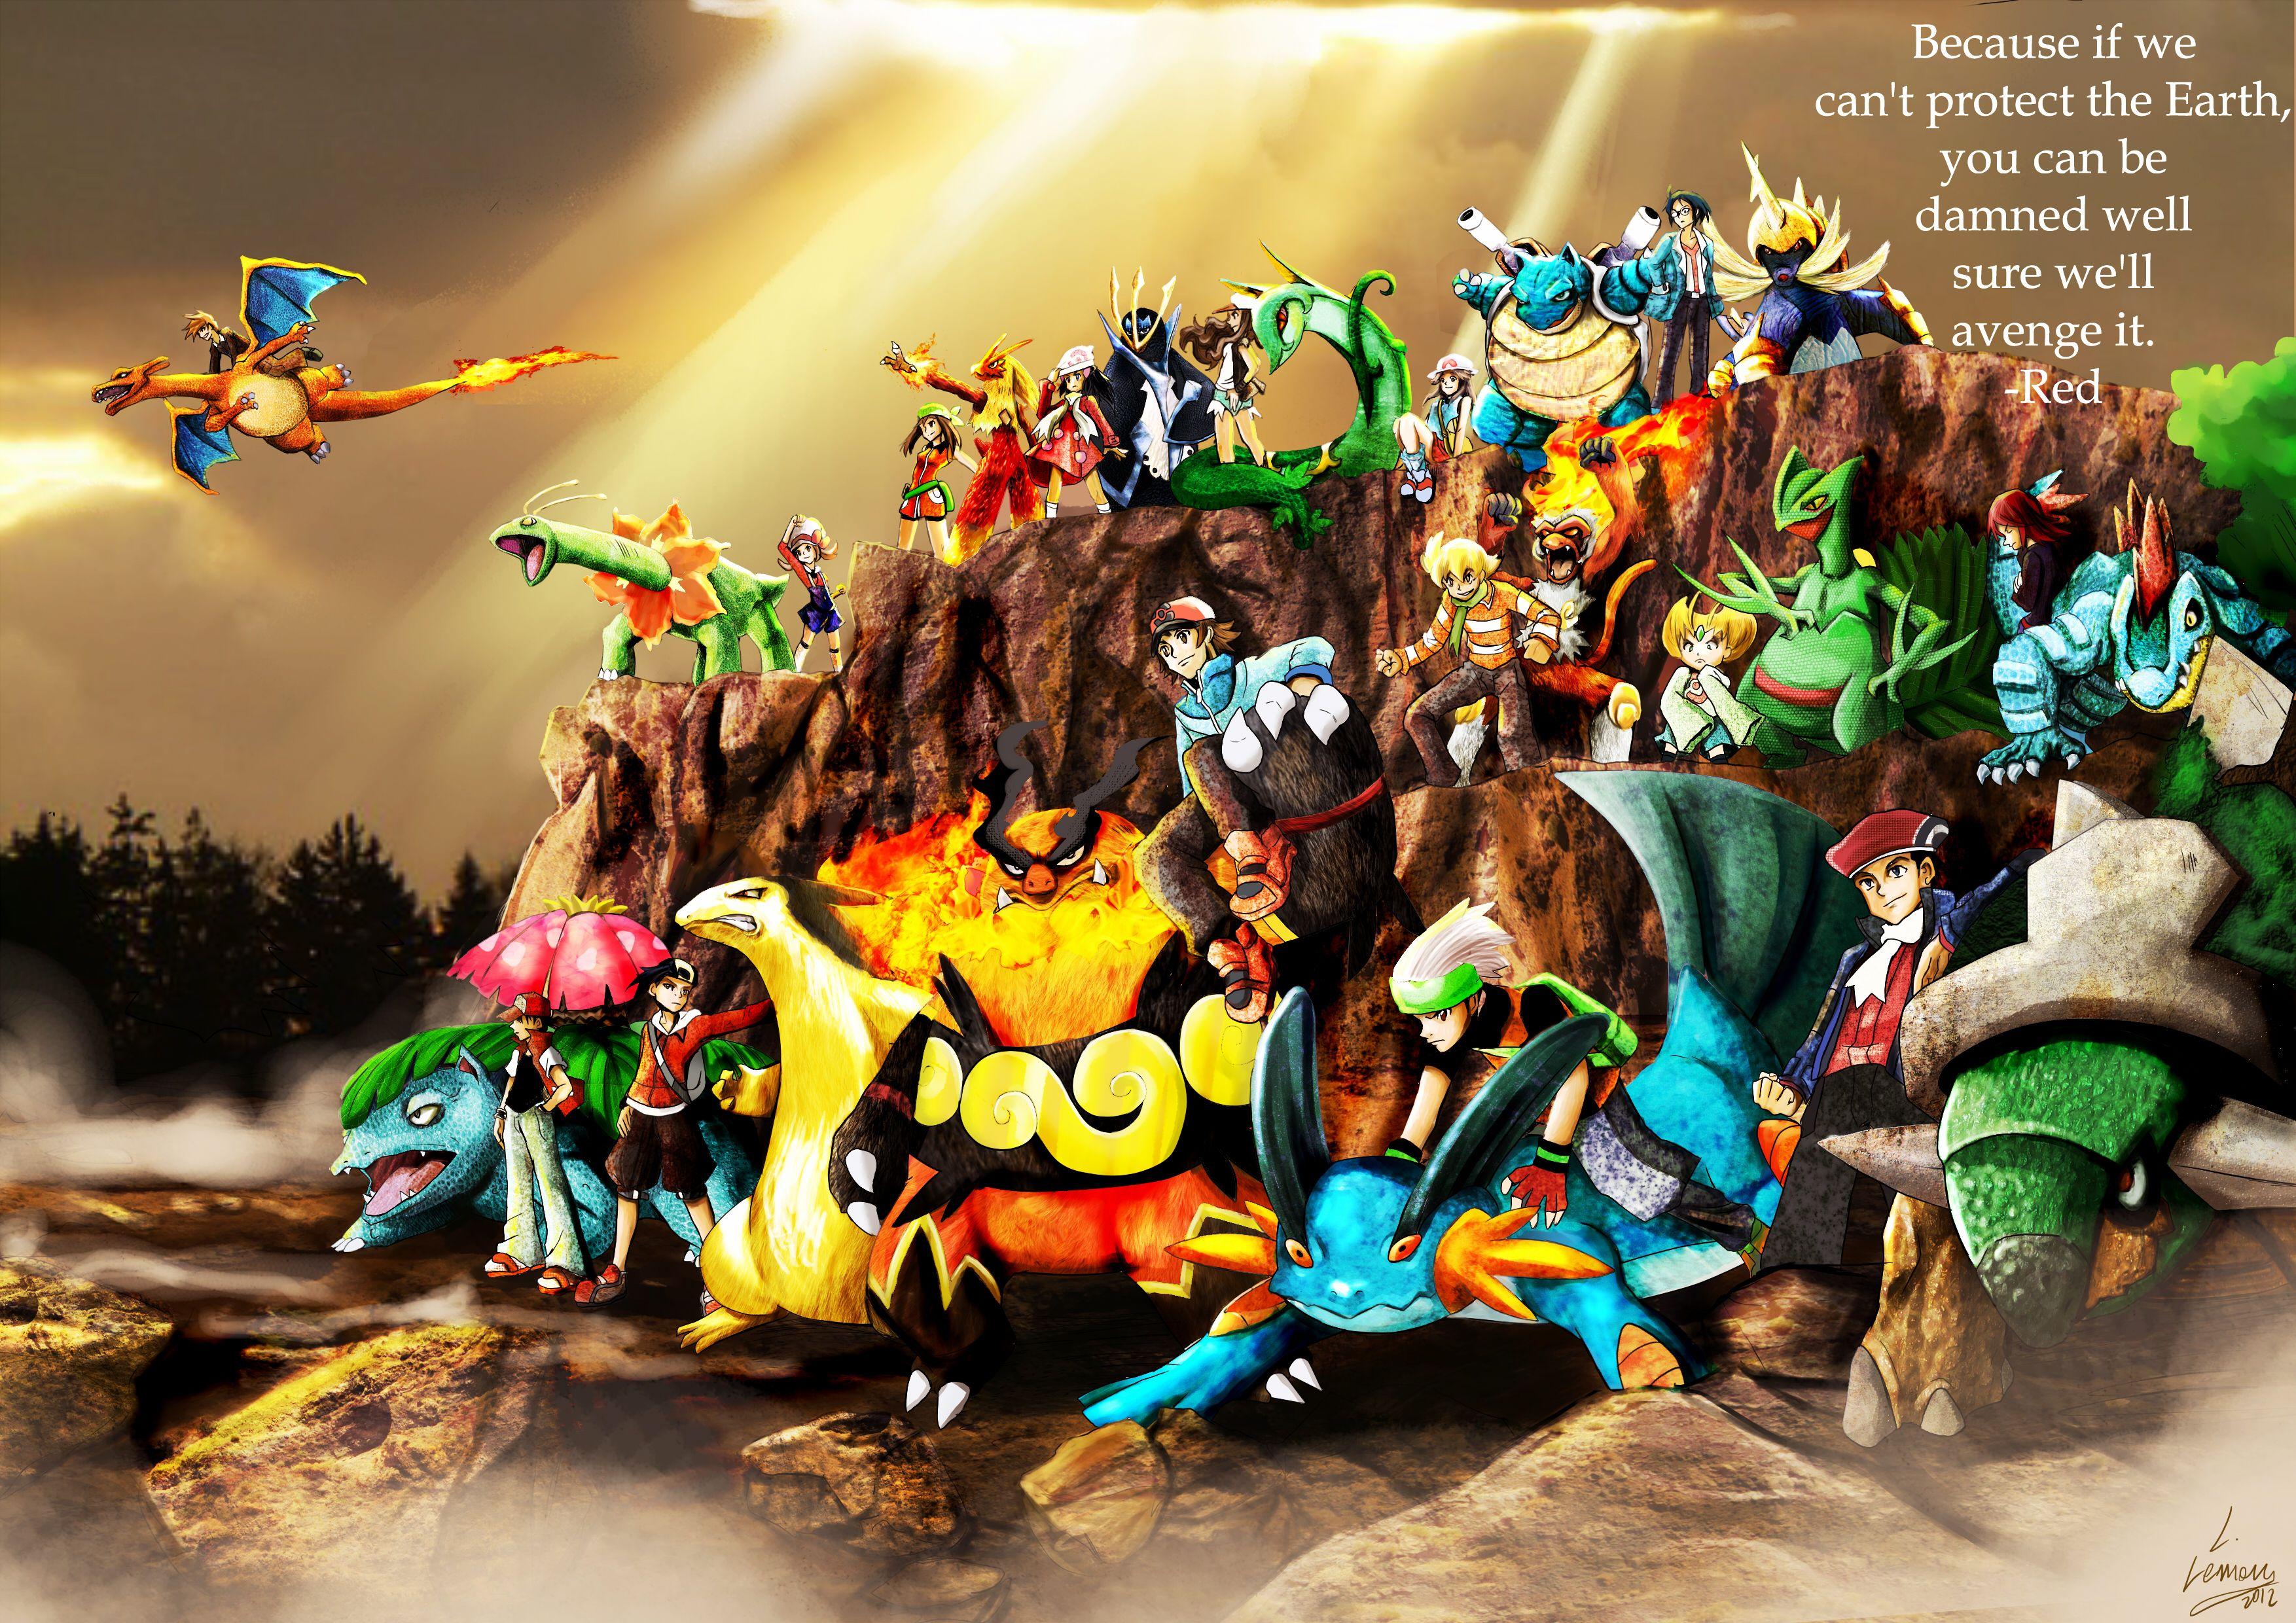 Anime Pokemon Pokémon Charizard (Pokémon) Gary Oak